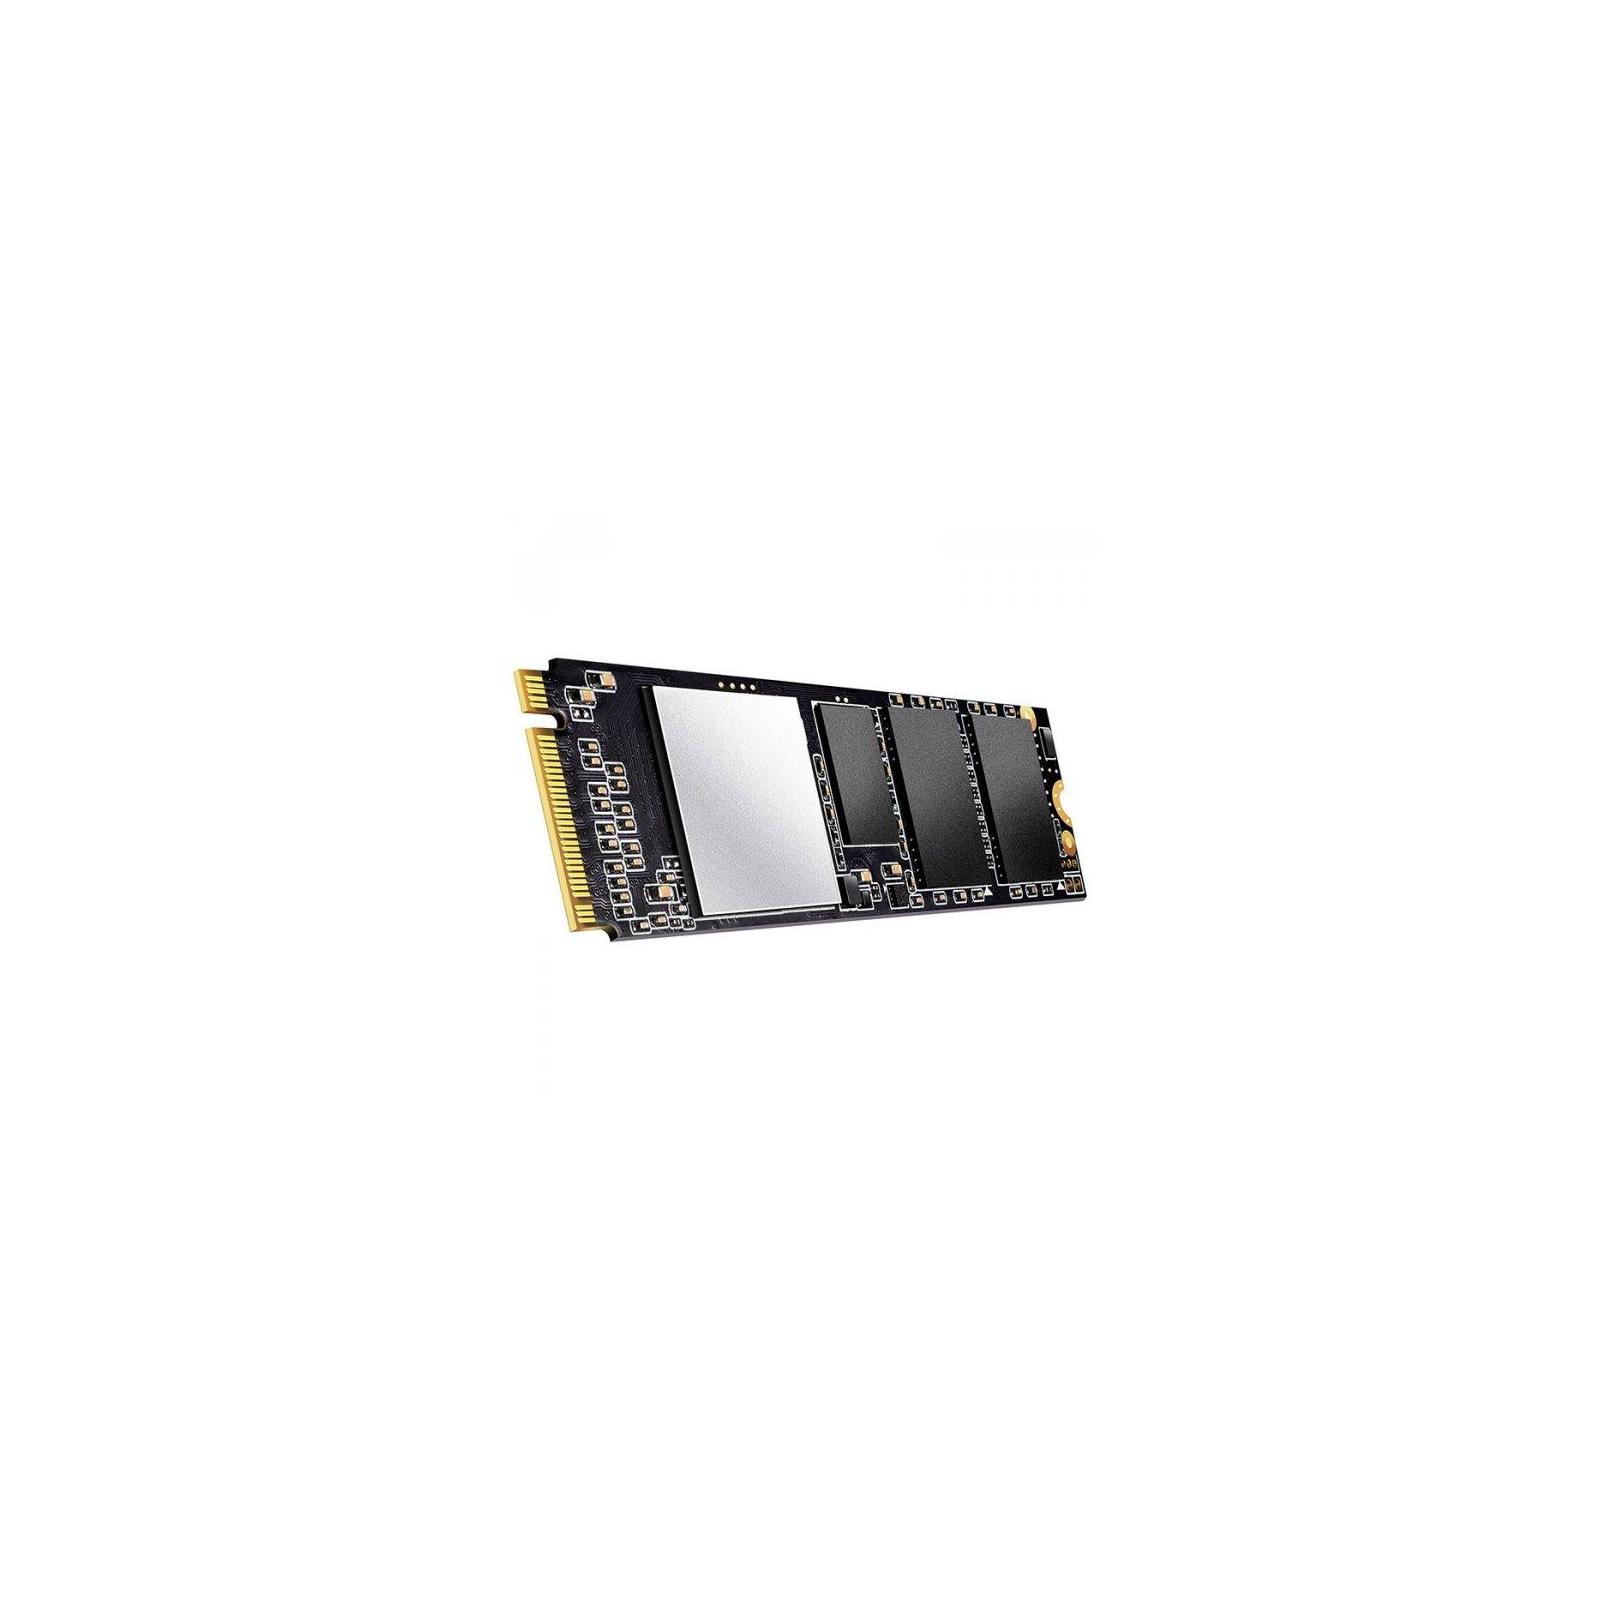 Накопитель SSD M.2 2280 1TB ADATA (ASX6000NP-1TT-C) изображение 2